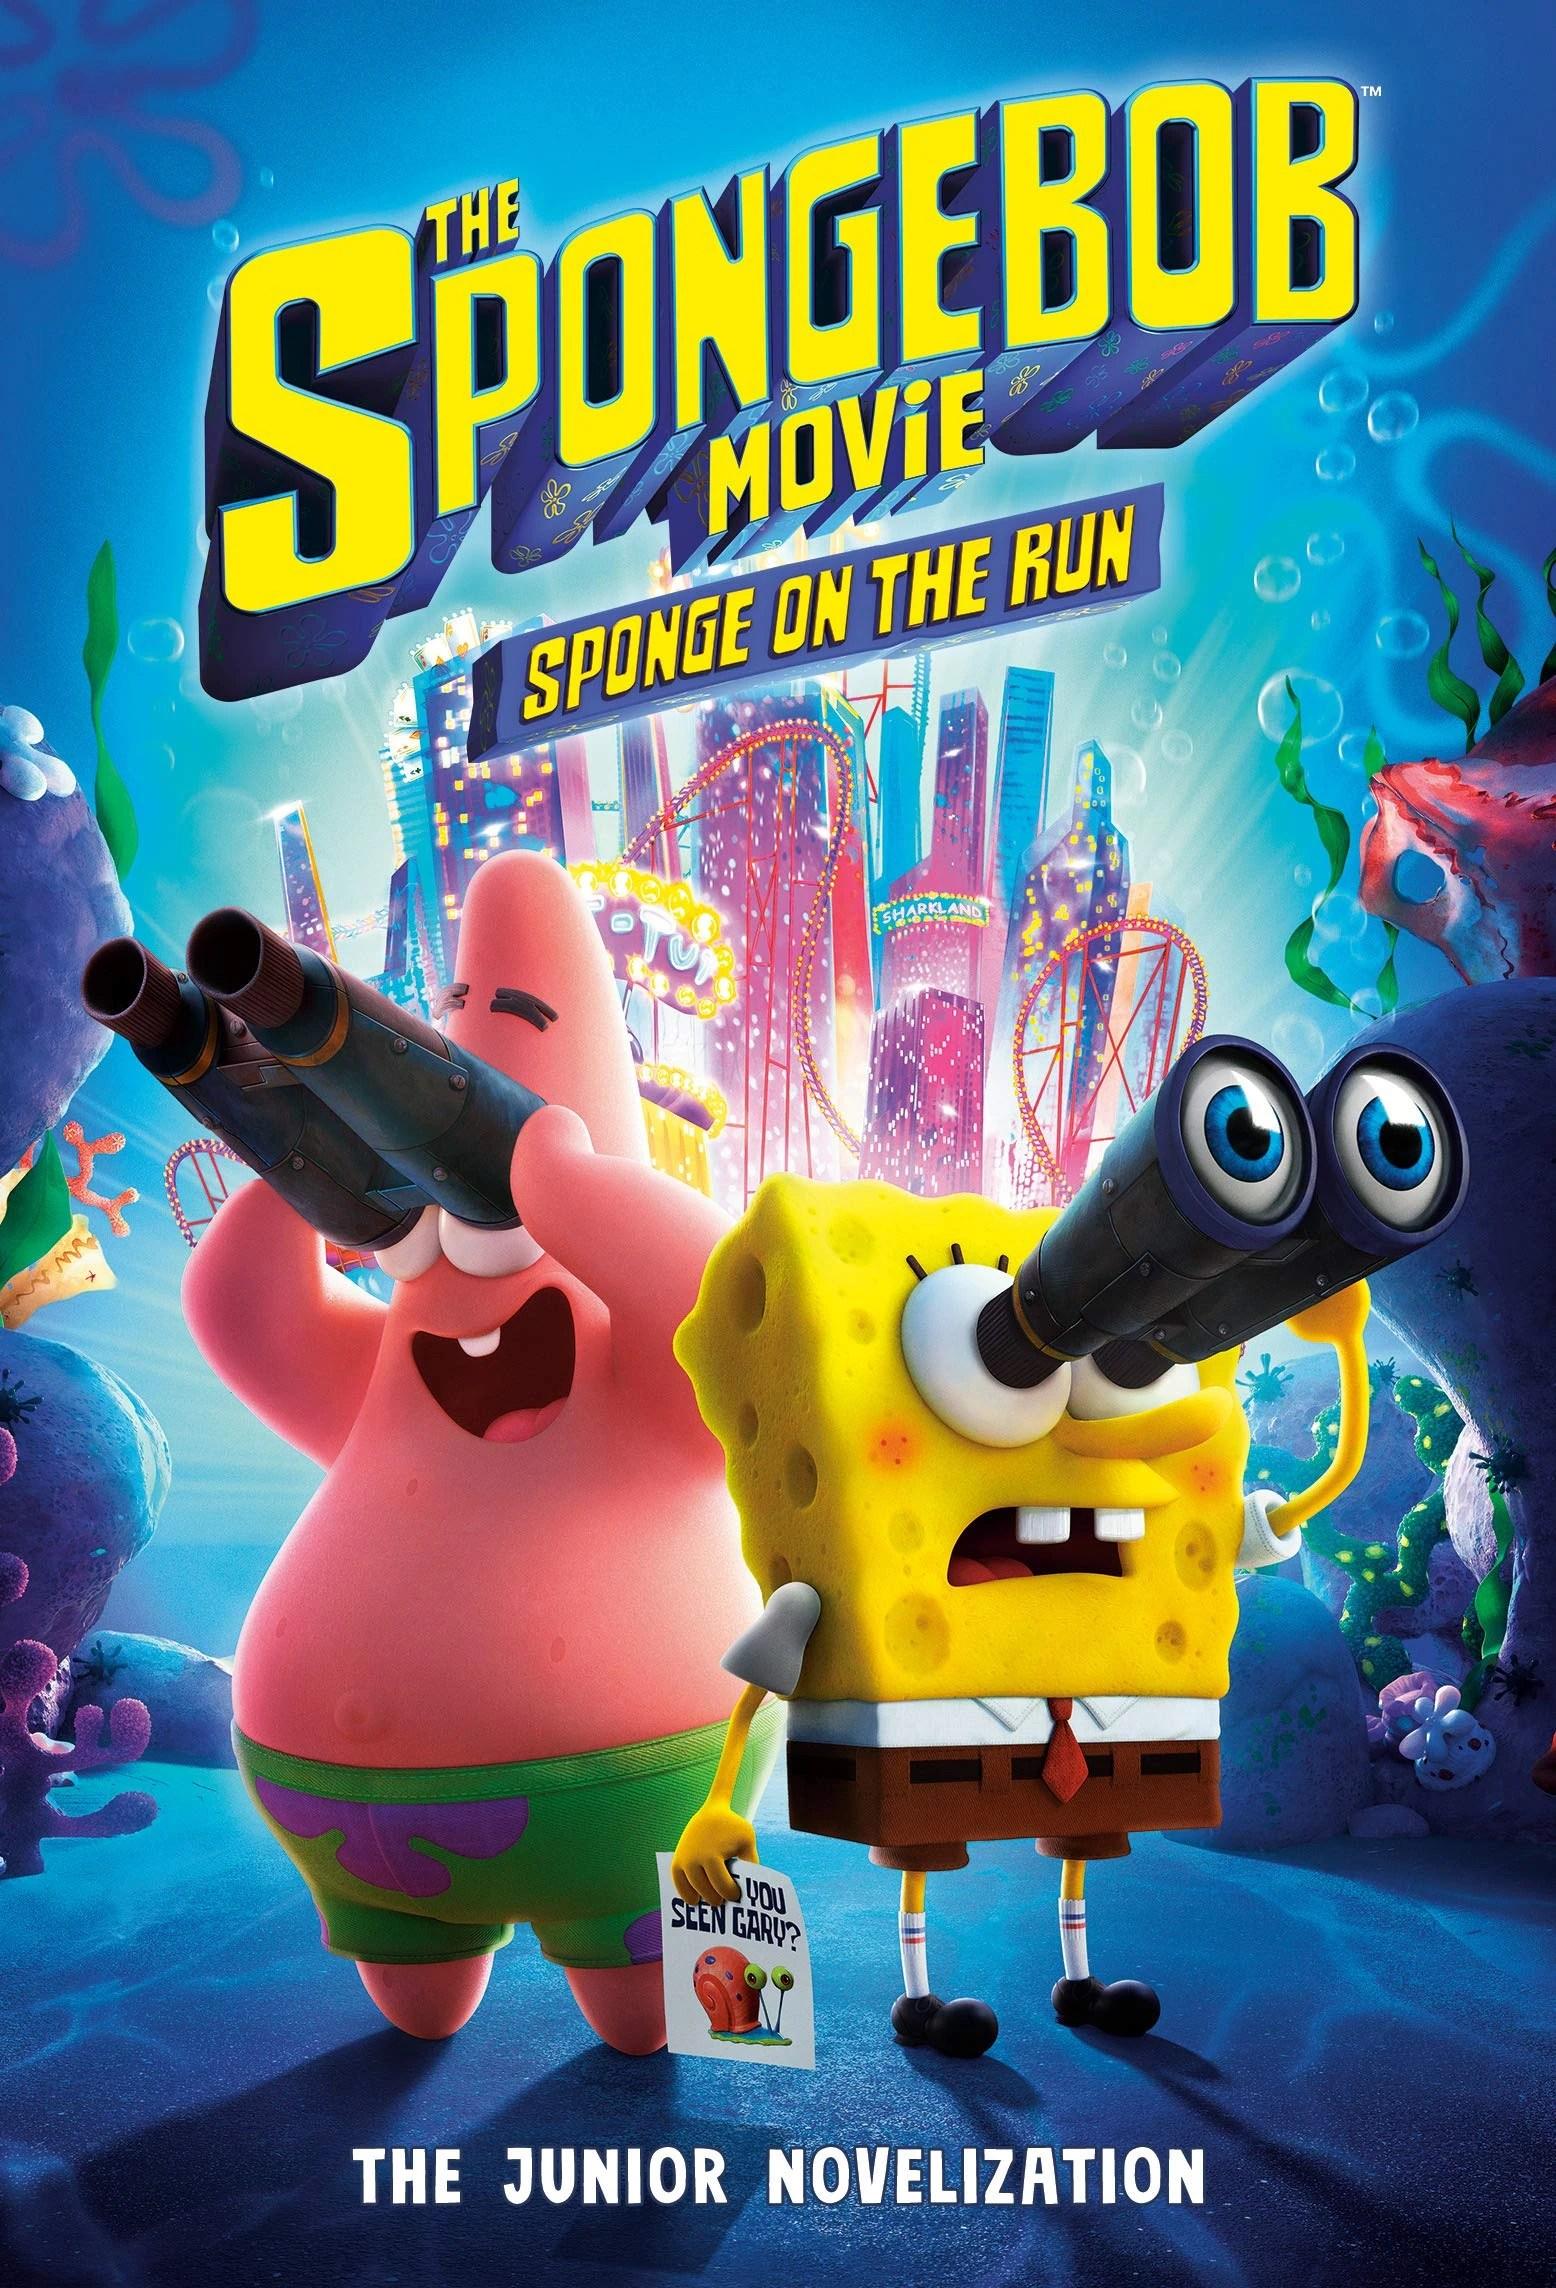 The Spongebob Movie It's A Wonderful Sponge : spongebob, movie, wonderful, sponge, SpongeBob, Movie:, Sponge, Junior, Novelization, Encyclopedia, SpongeBobia, Fandom